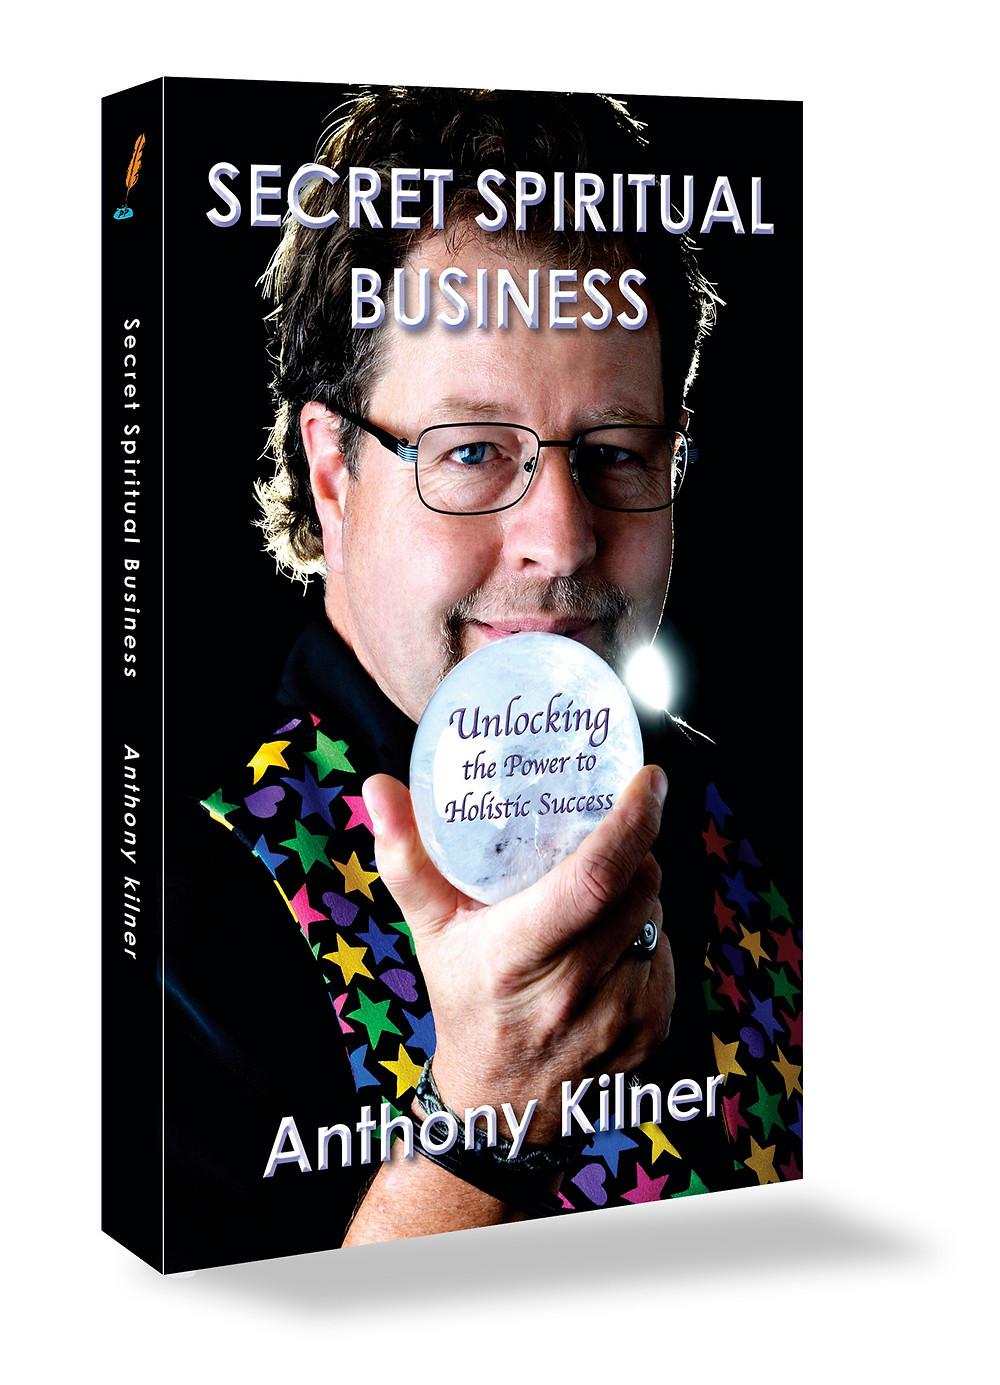 3D book_AnthonyKilner 2.jpg